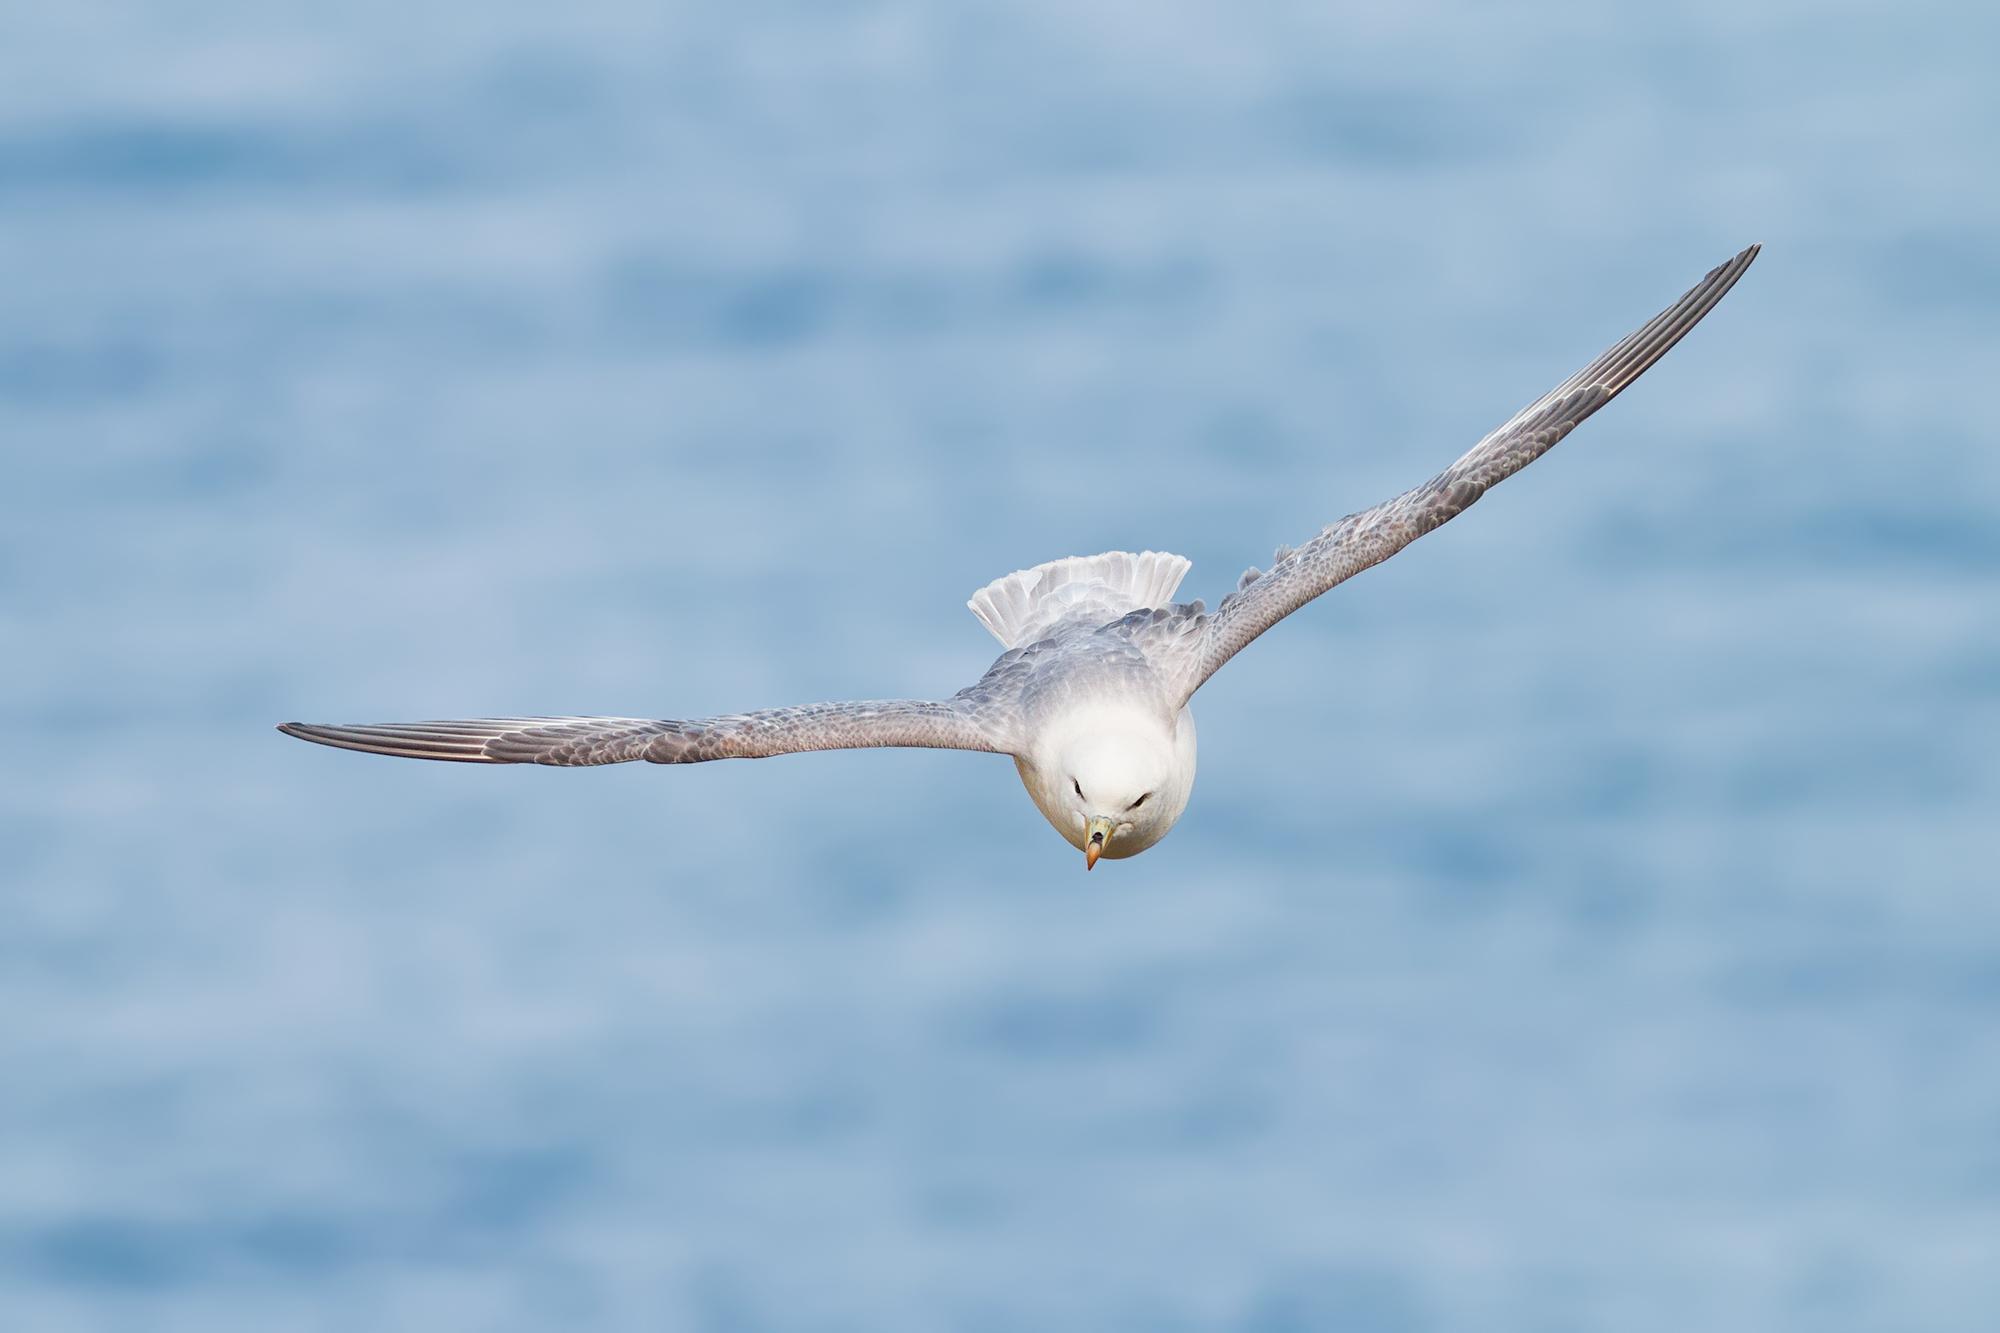 Stormfågel-JPEG_web 3.jpg